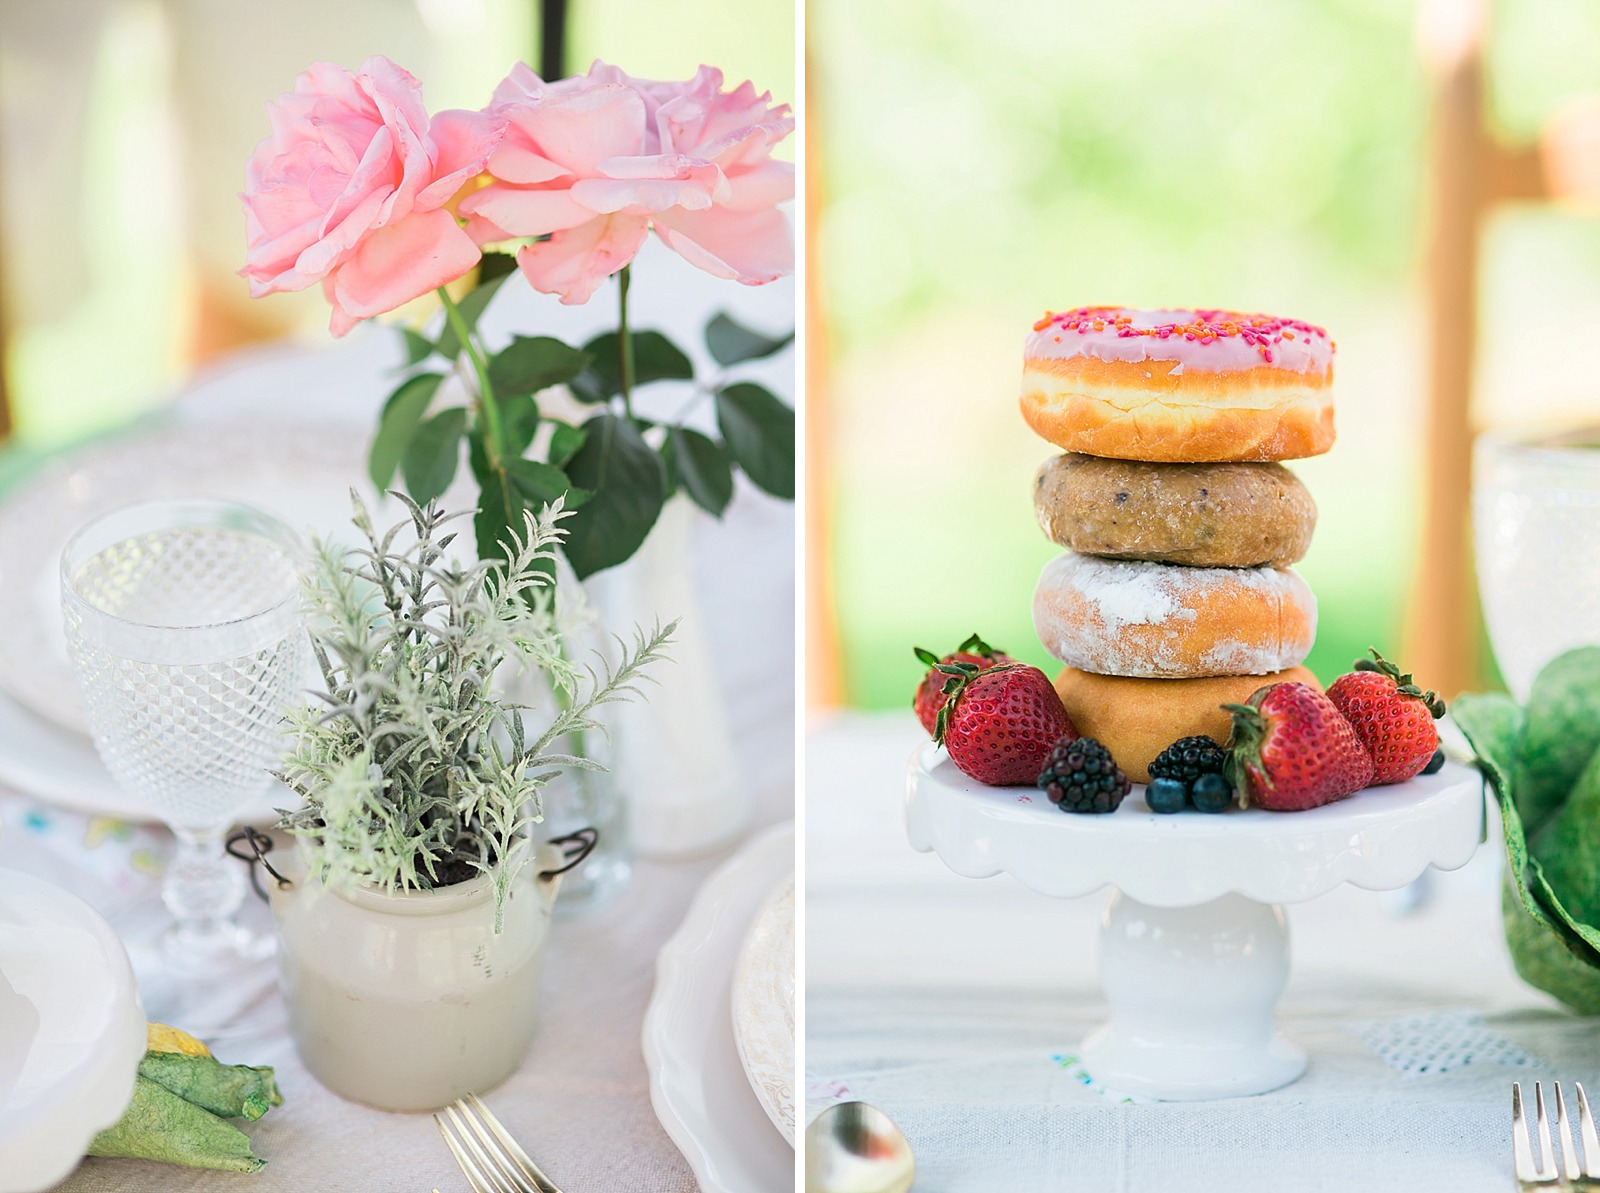 diana-elizabeth-blog-lifestyle-dunkin-creamers-dunkin-donuts-brunch-book-club--4548